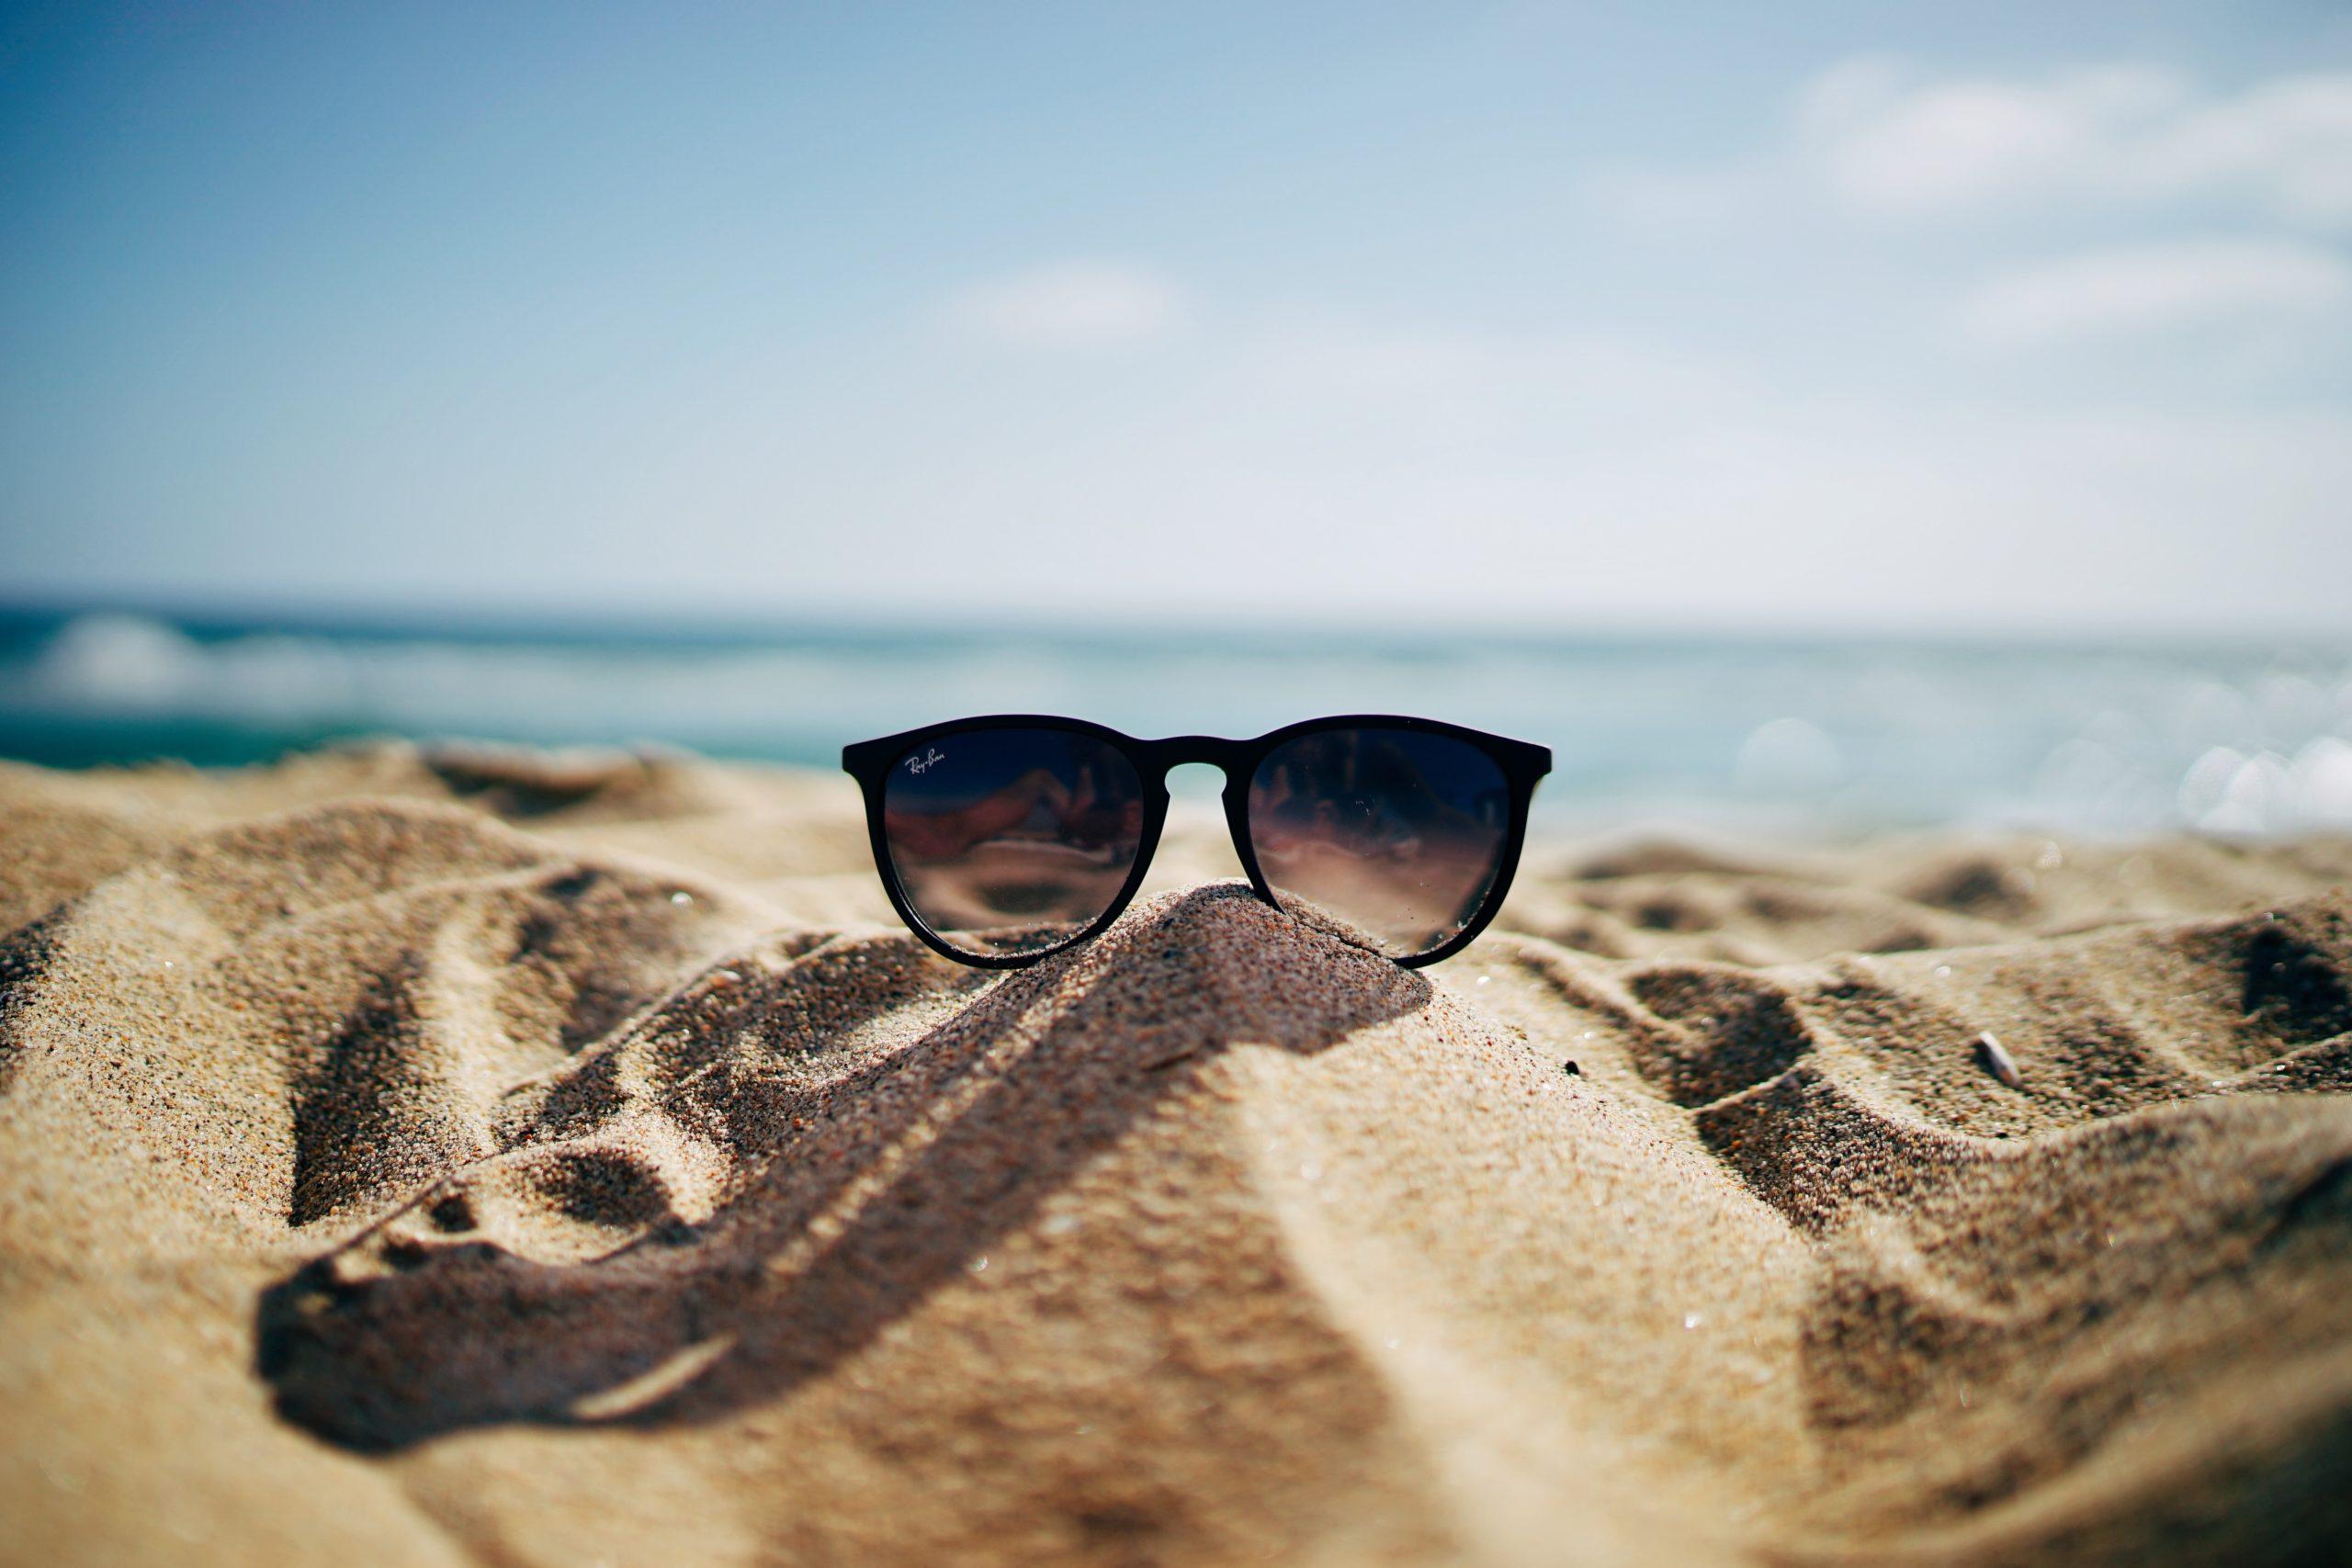 sunglasses on sand at the beach